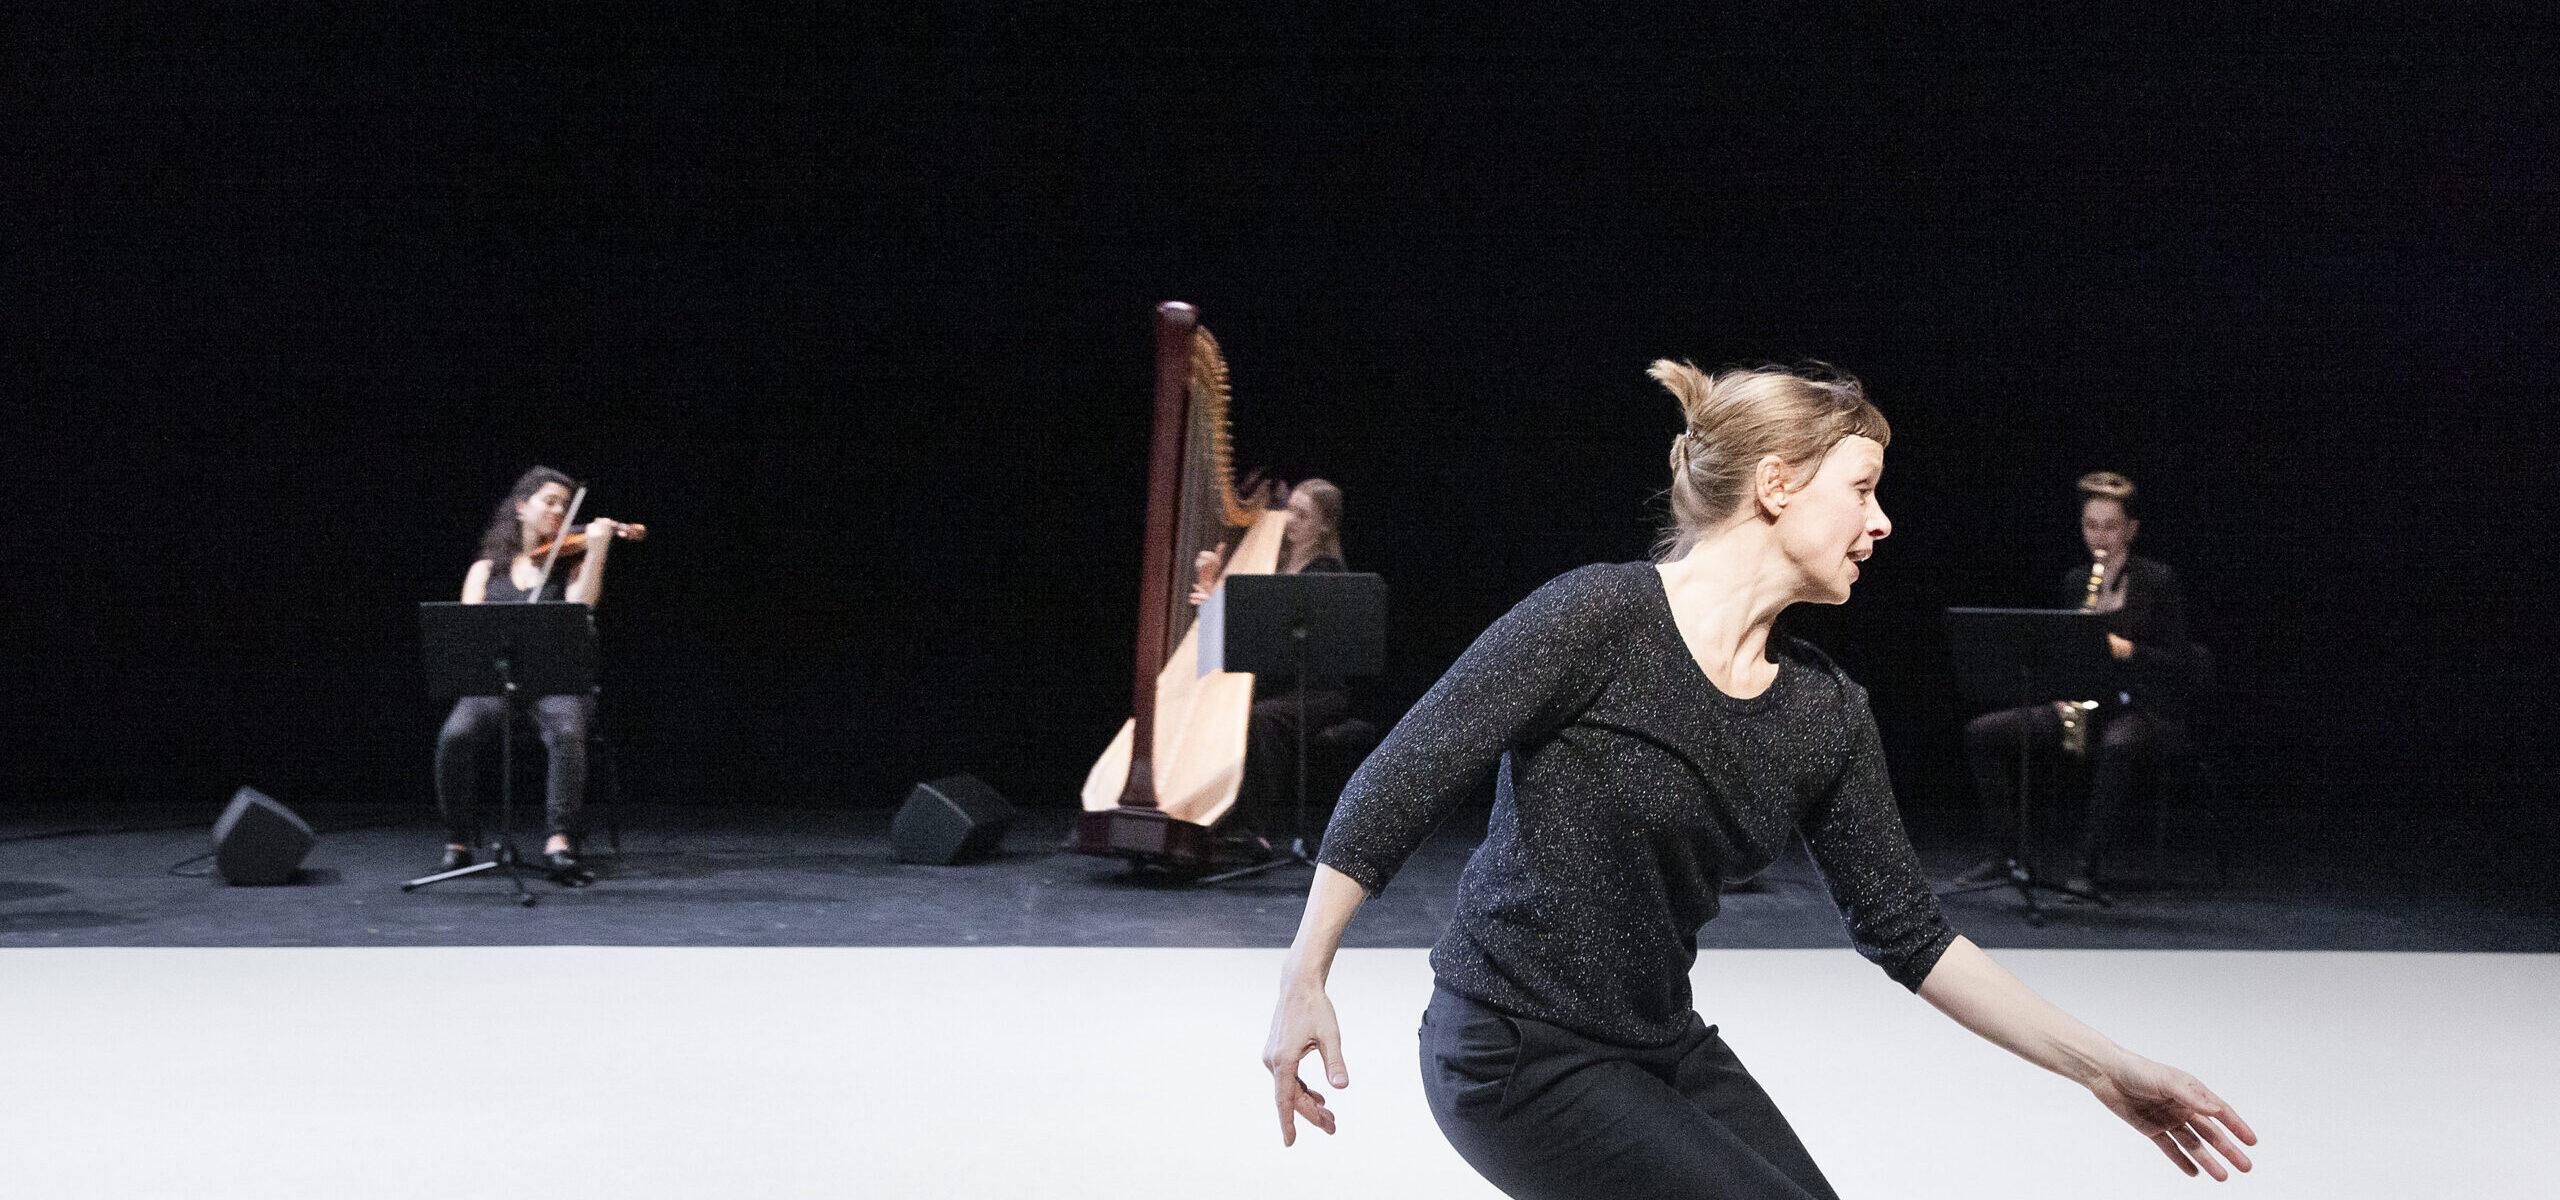 2b Company, «Giselle», © Dorothée Thébert-Filliger